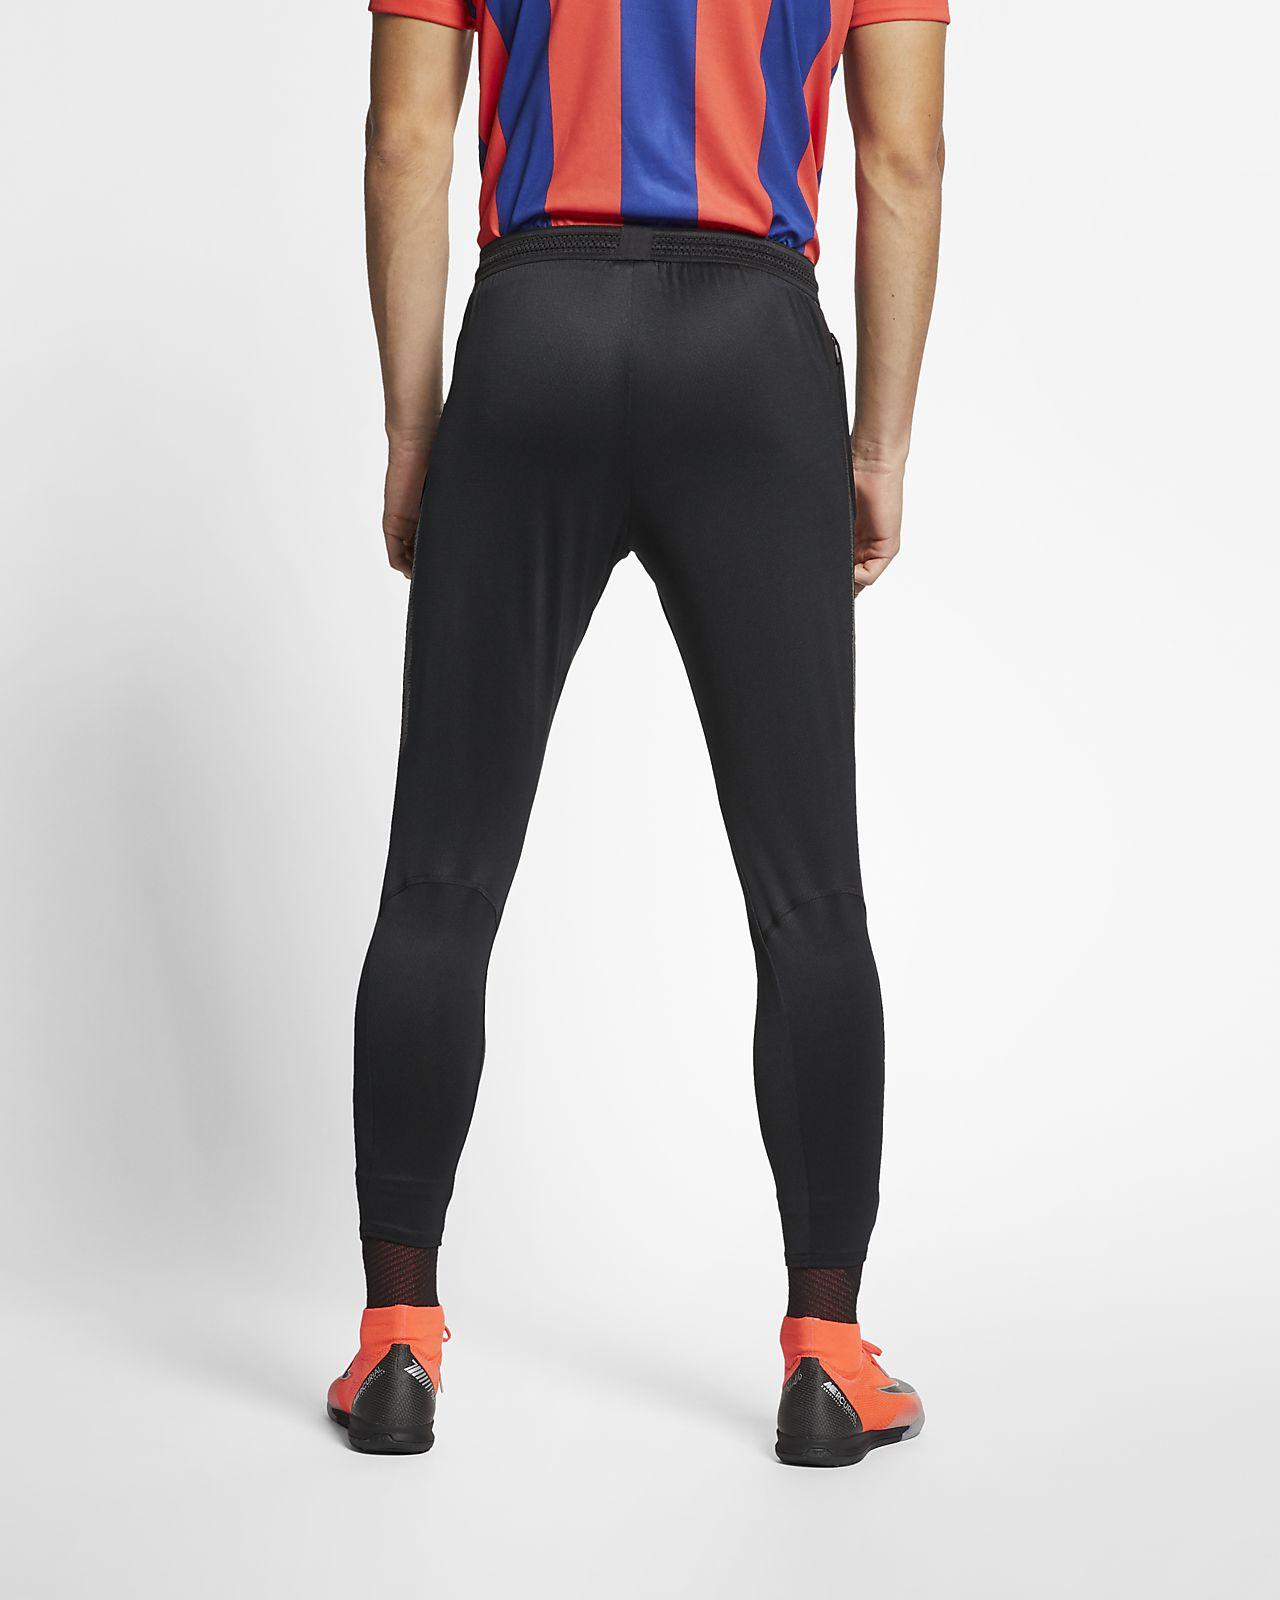 91bf691a8549 Nike Flex Strike Men s Football Pants. Nike.com ZA